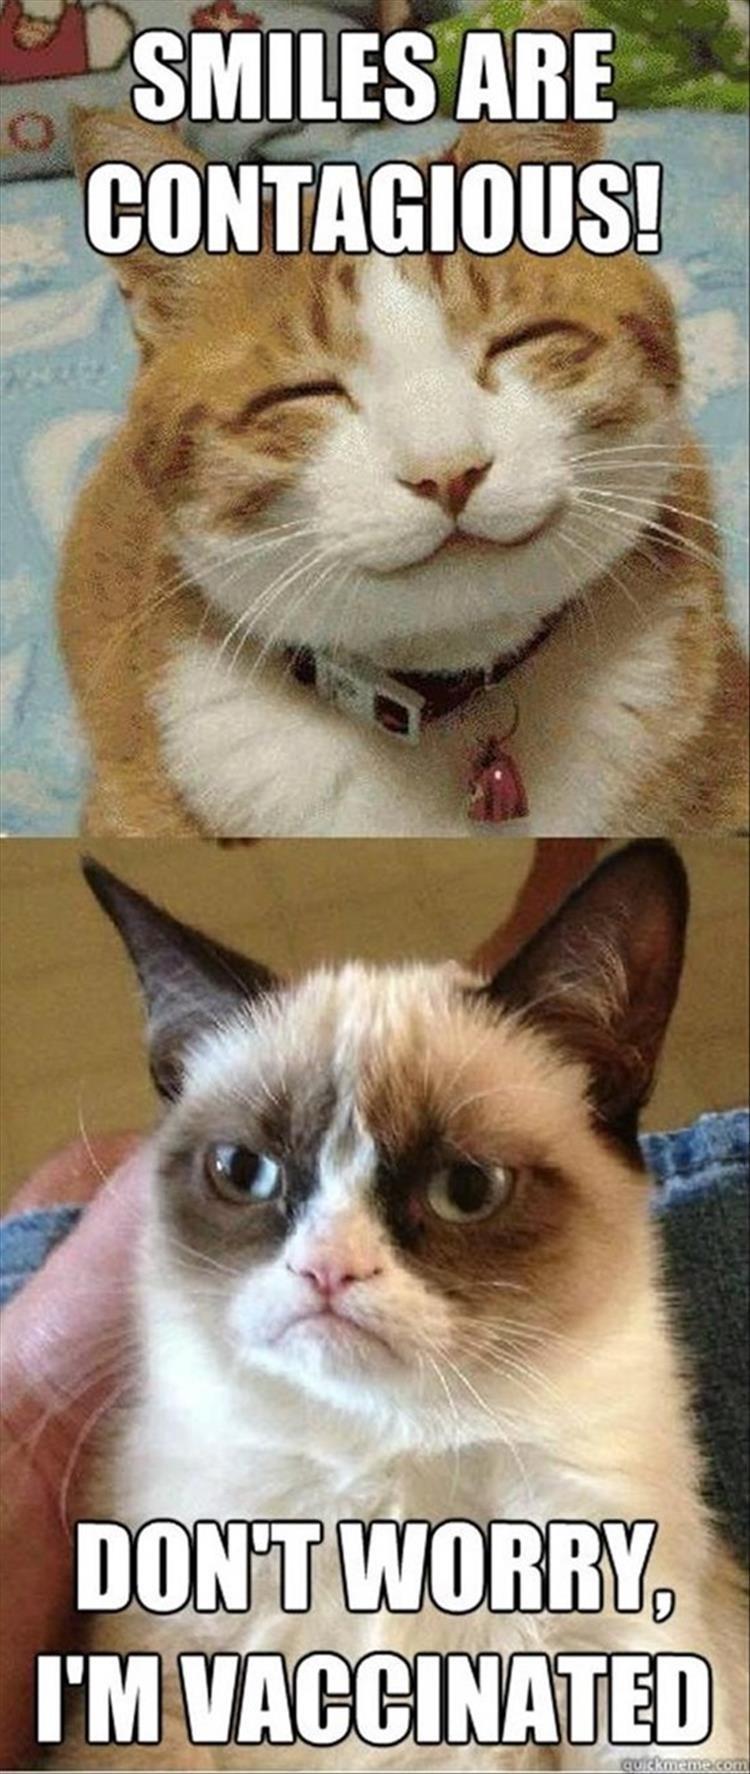 Cat - SMILES ARE CONTAGIOUS! DONT WORRY I'M VACCINATED quickmeme.com